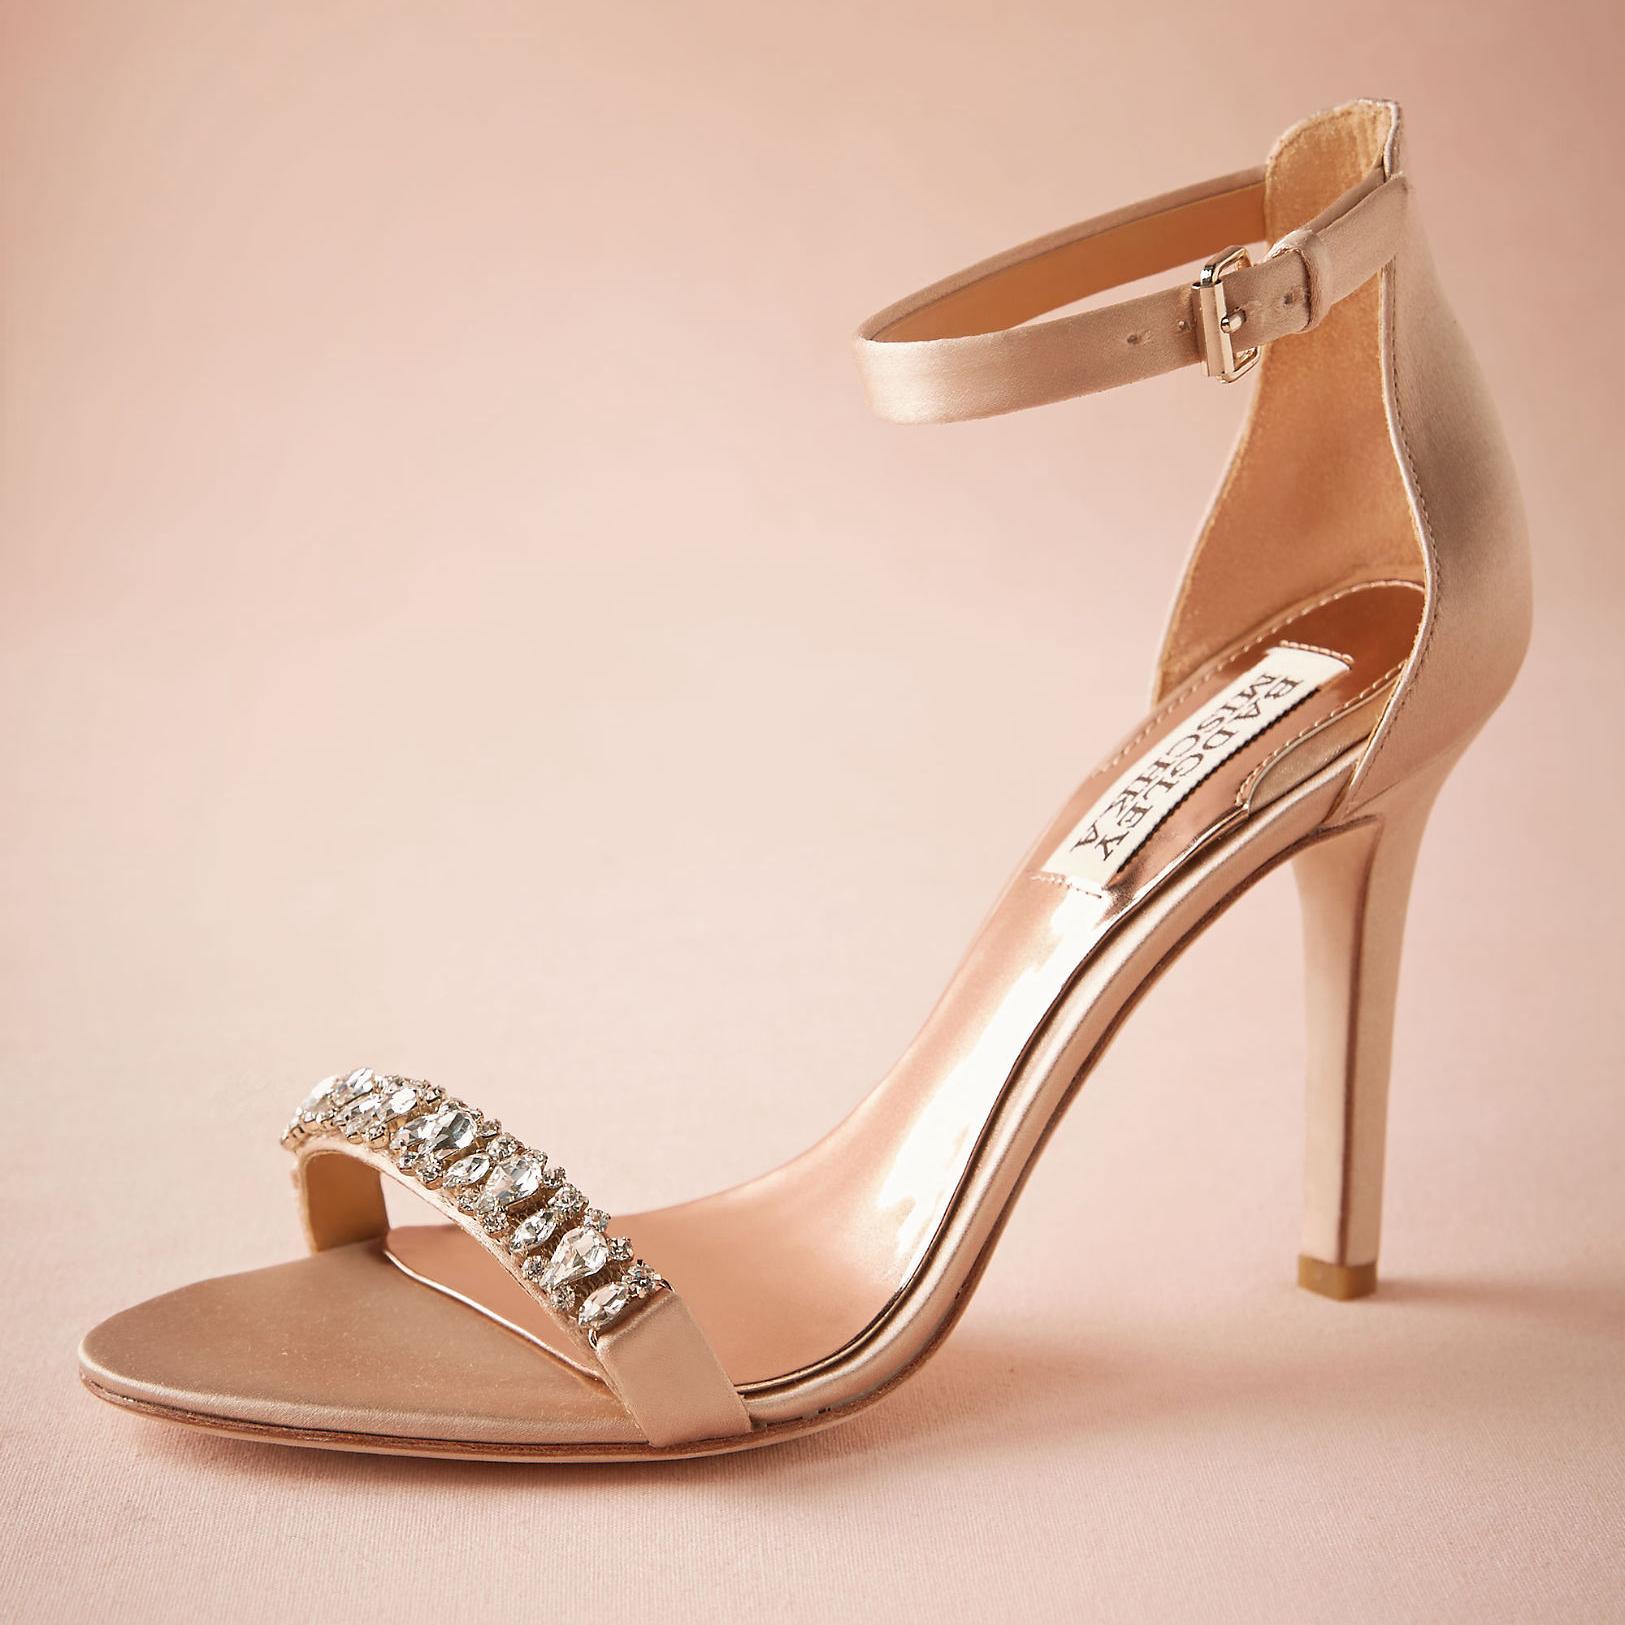 Fashion Blush Wedding Shoes 35 Satin Wrapped Heel Crystals